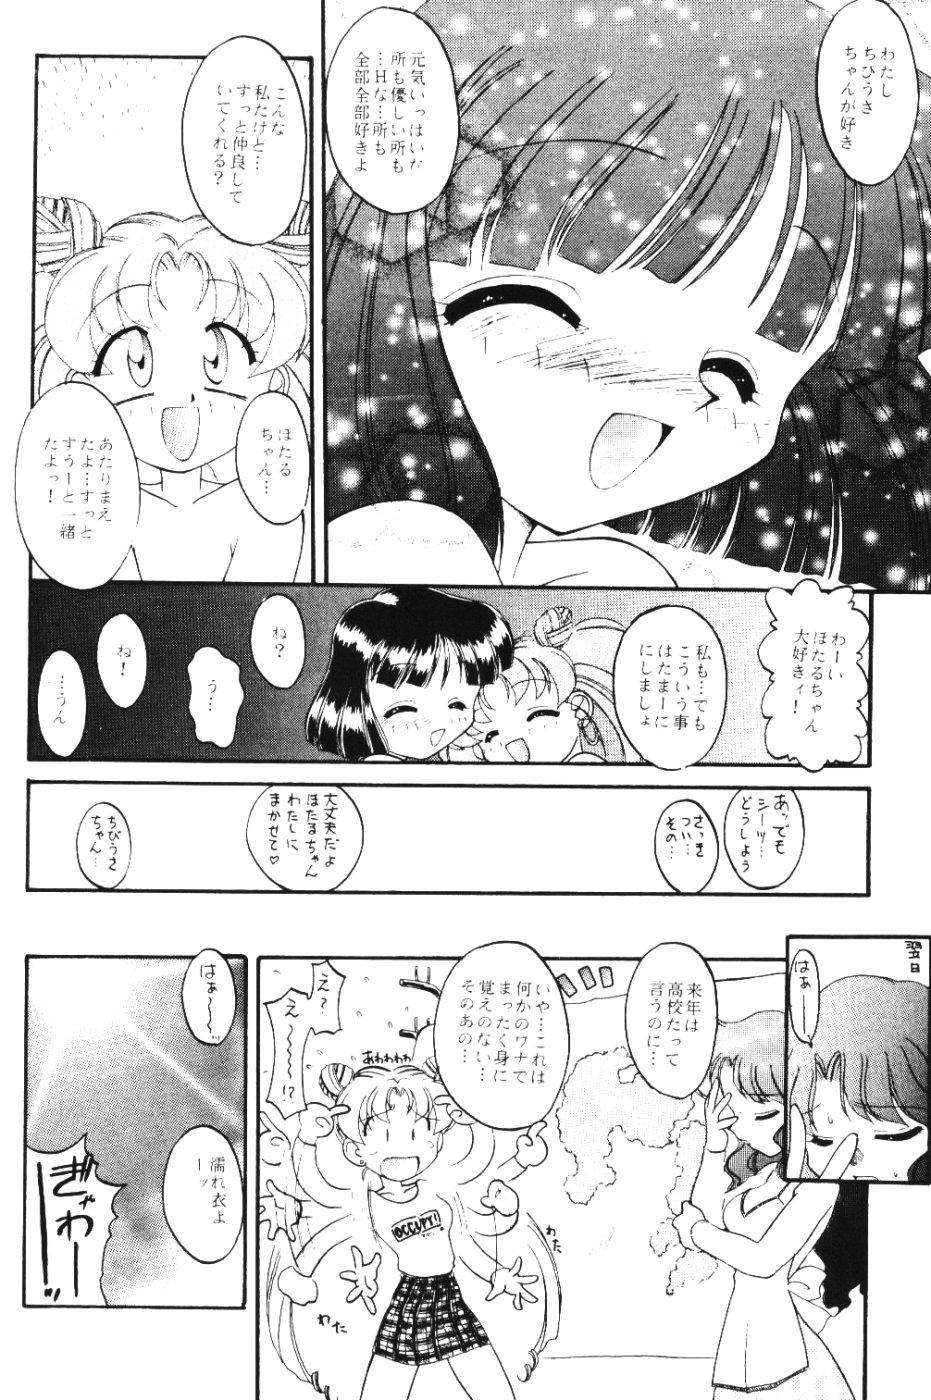 Moon Memories Vol. 2 22